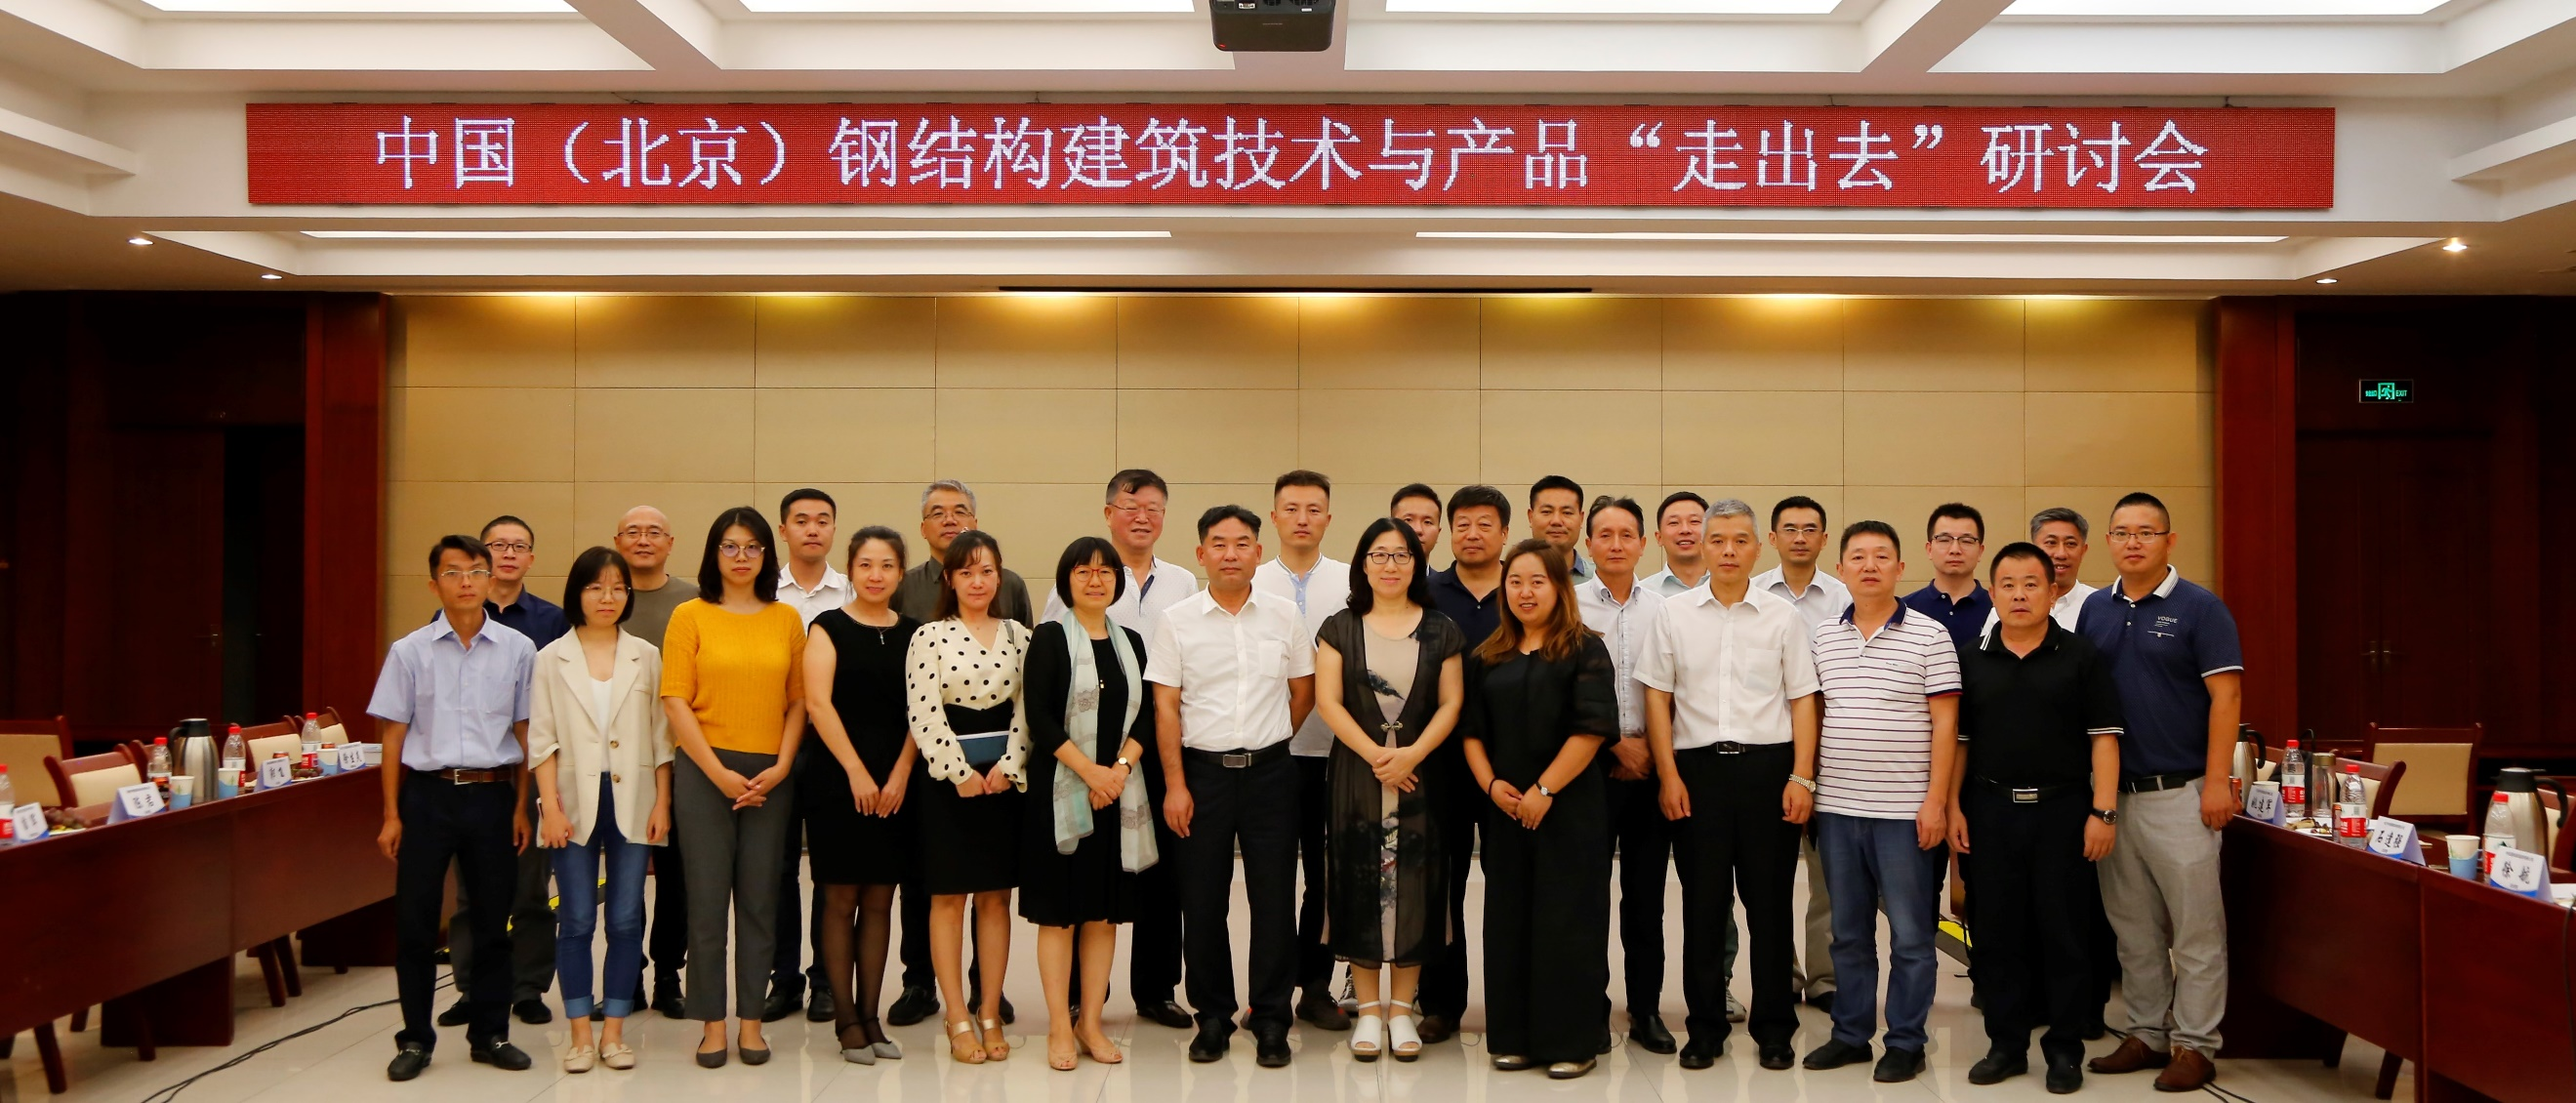 "D20 | 中国(北京)钢结构建筑技术与产品""走出去""和研讨会"